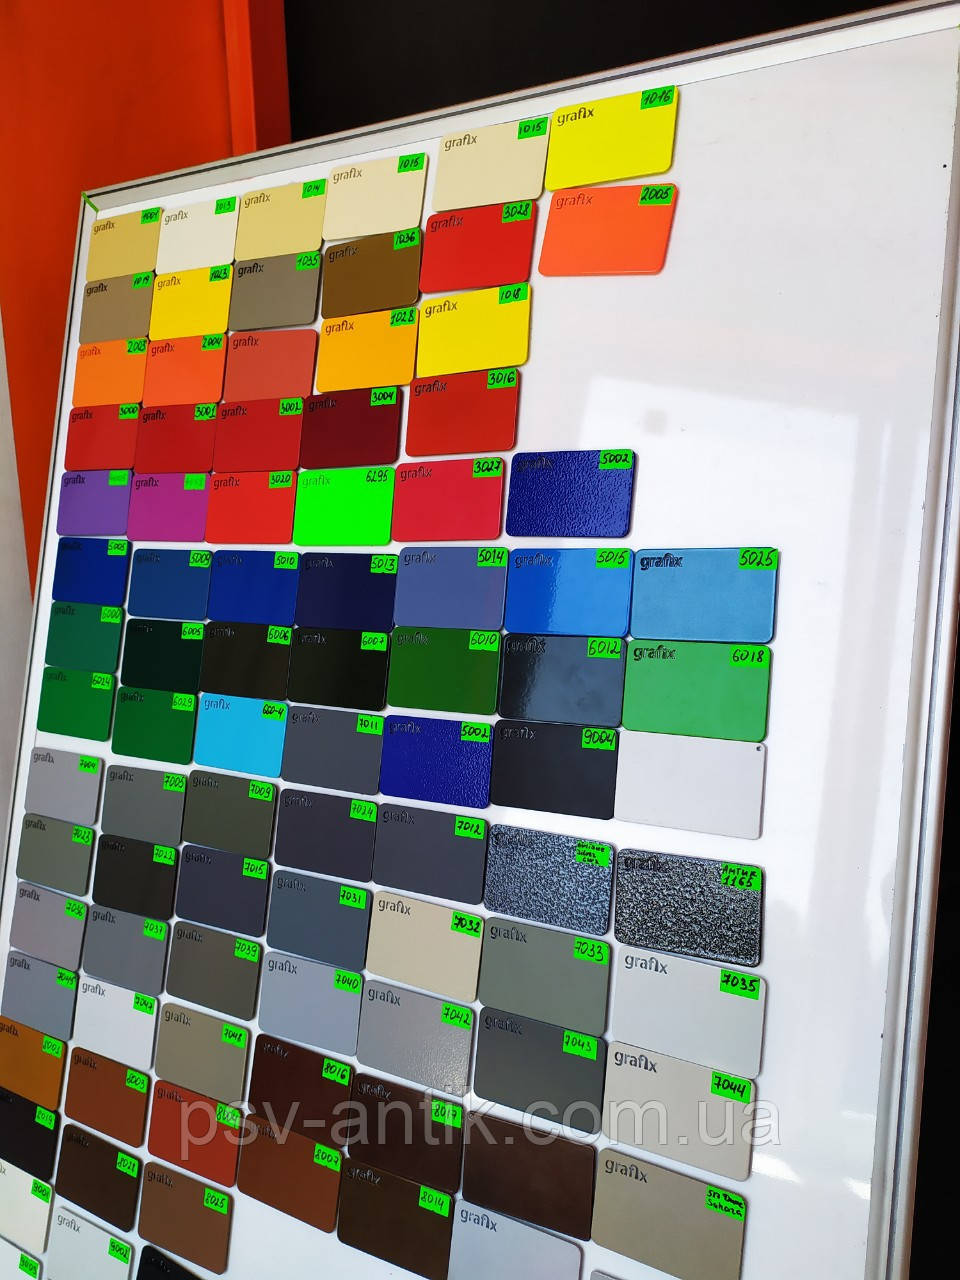 Порошковая краска глянцевая, полиэфирная, архитектурная, 7042